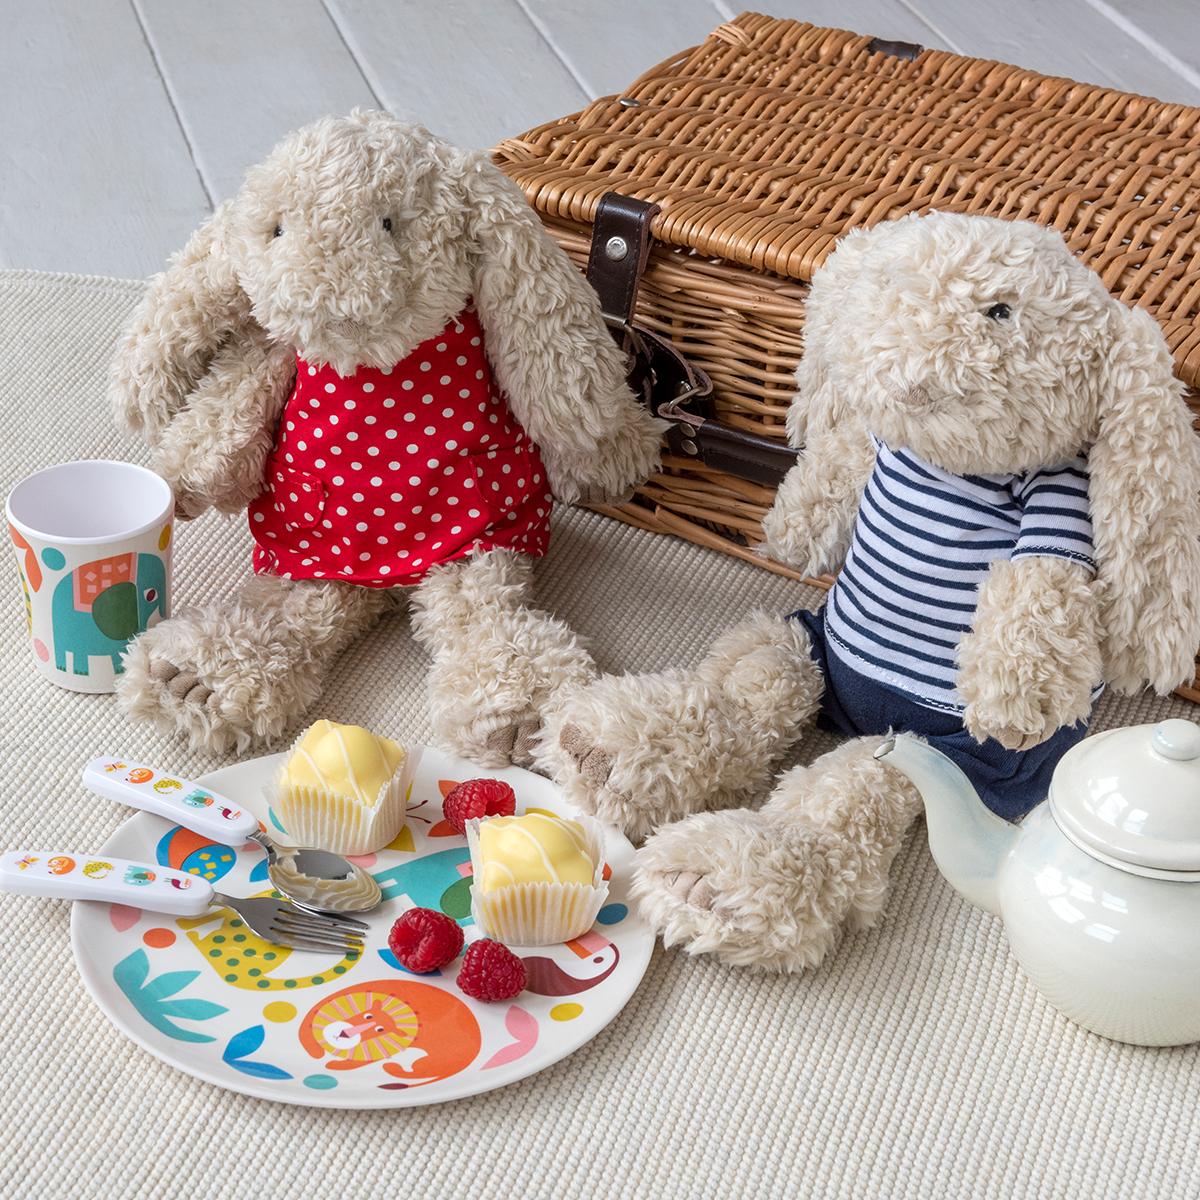 Teddy bears picnic with pot of tea